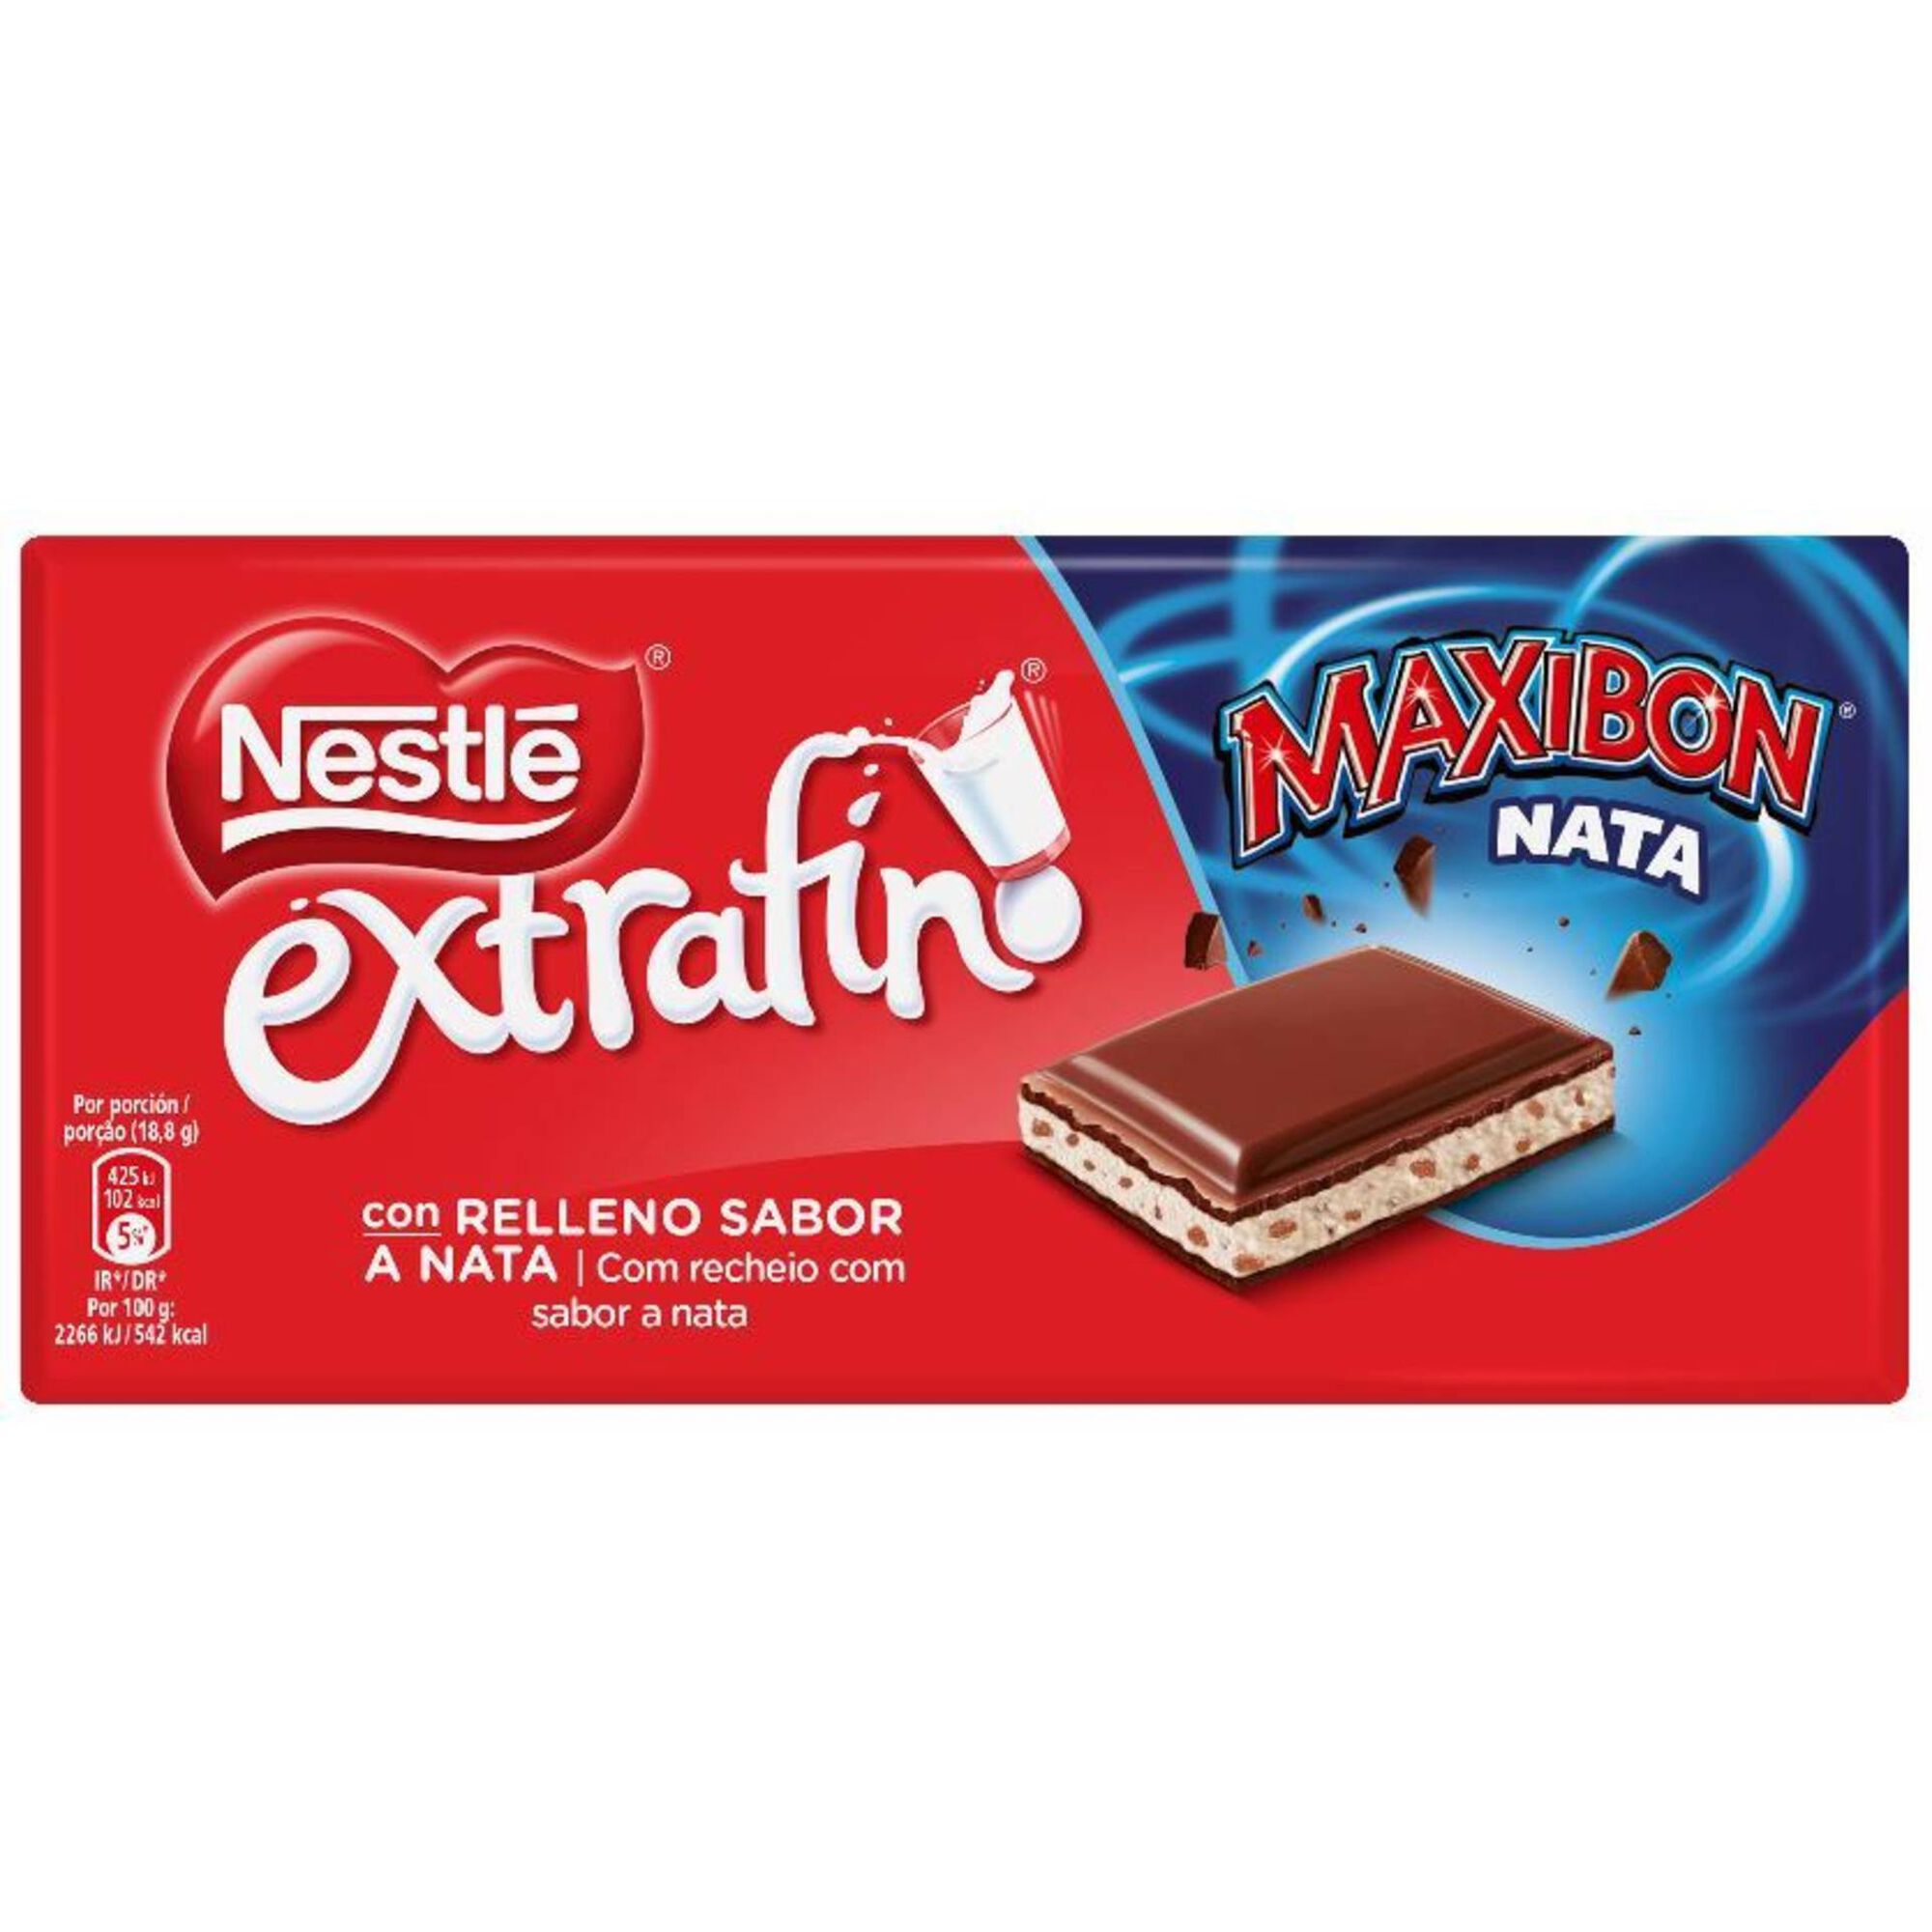 Tablete de Chocolate de Leite com Bolacha Maxibon Extrafino